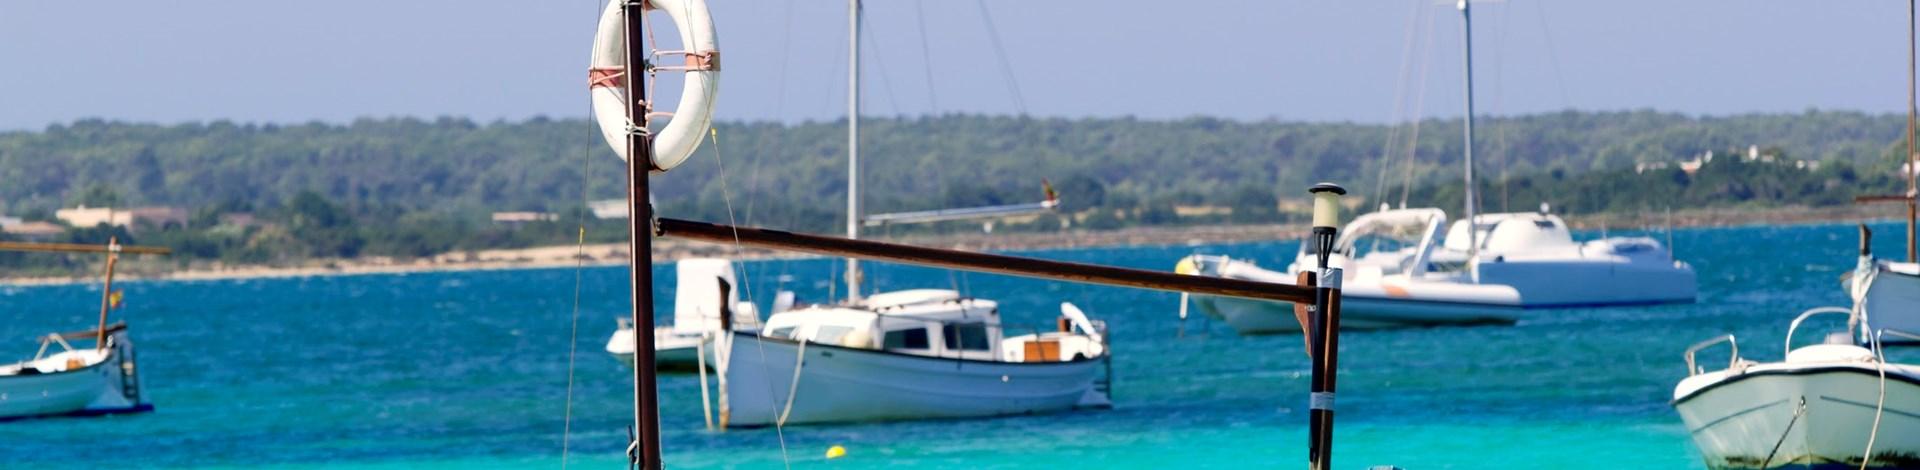 Playa Ponent